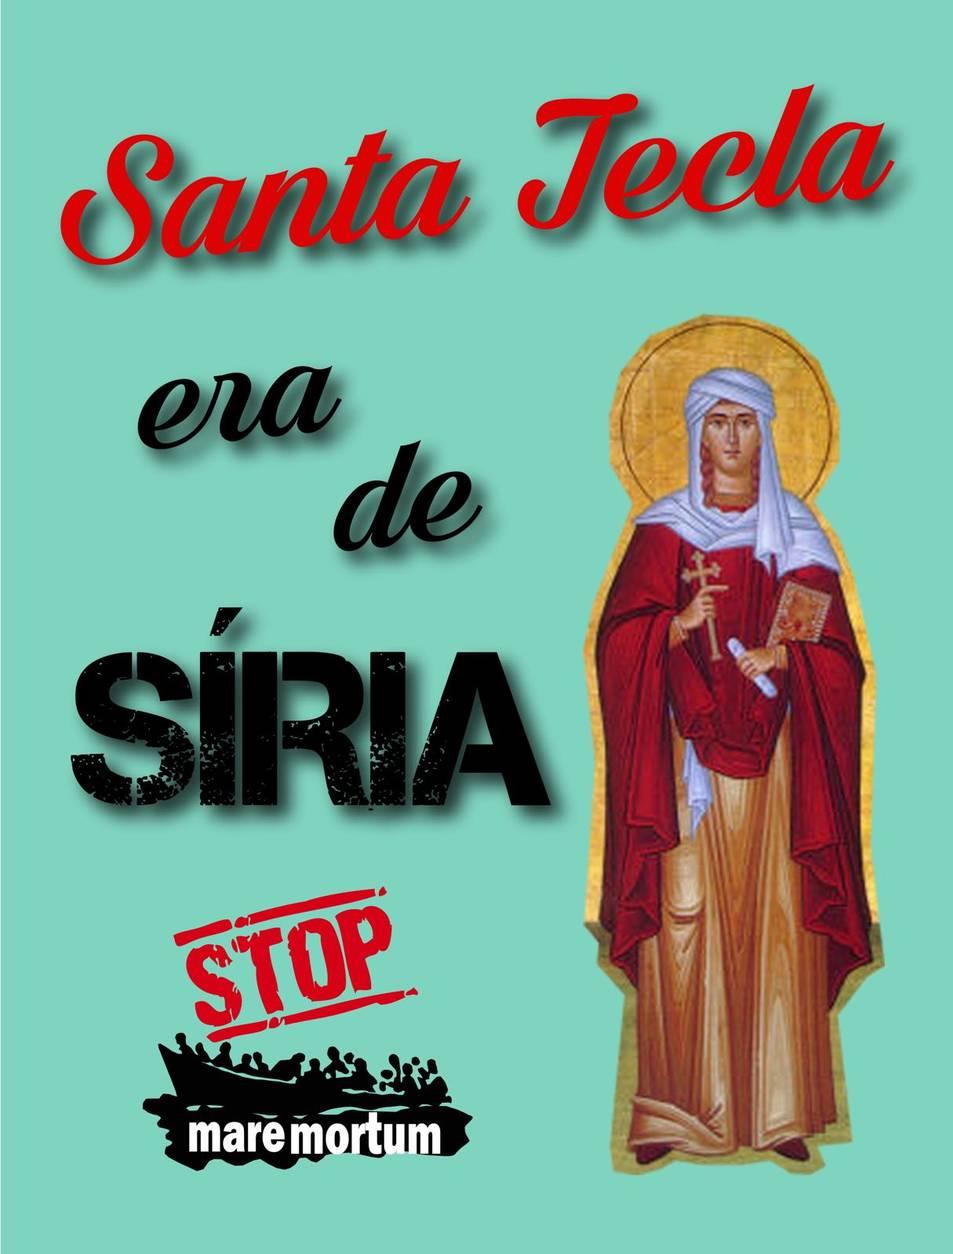 Santa Tecla reivindicativa